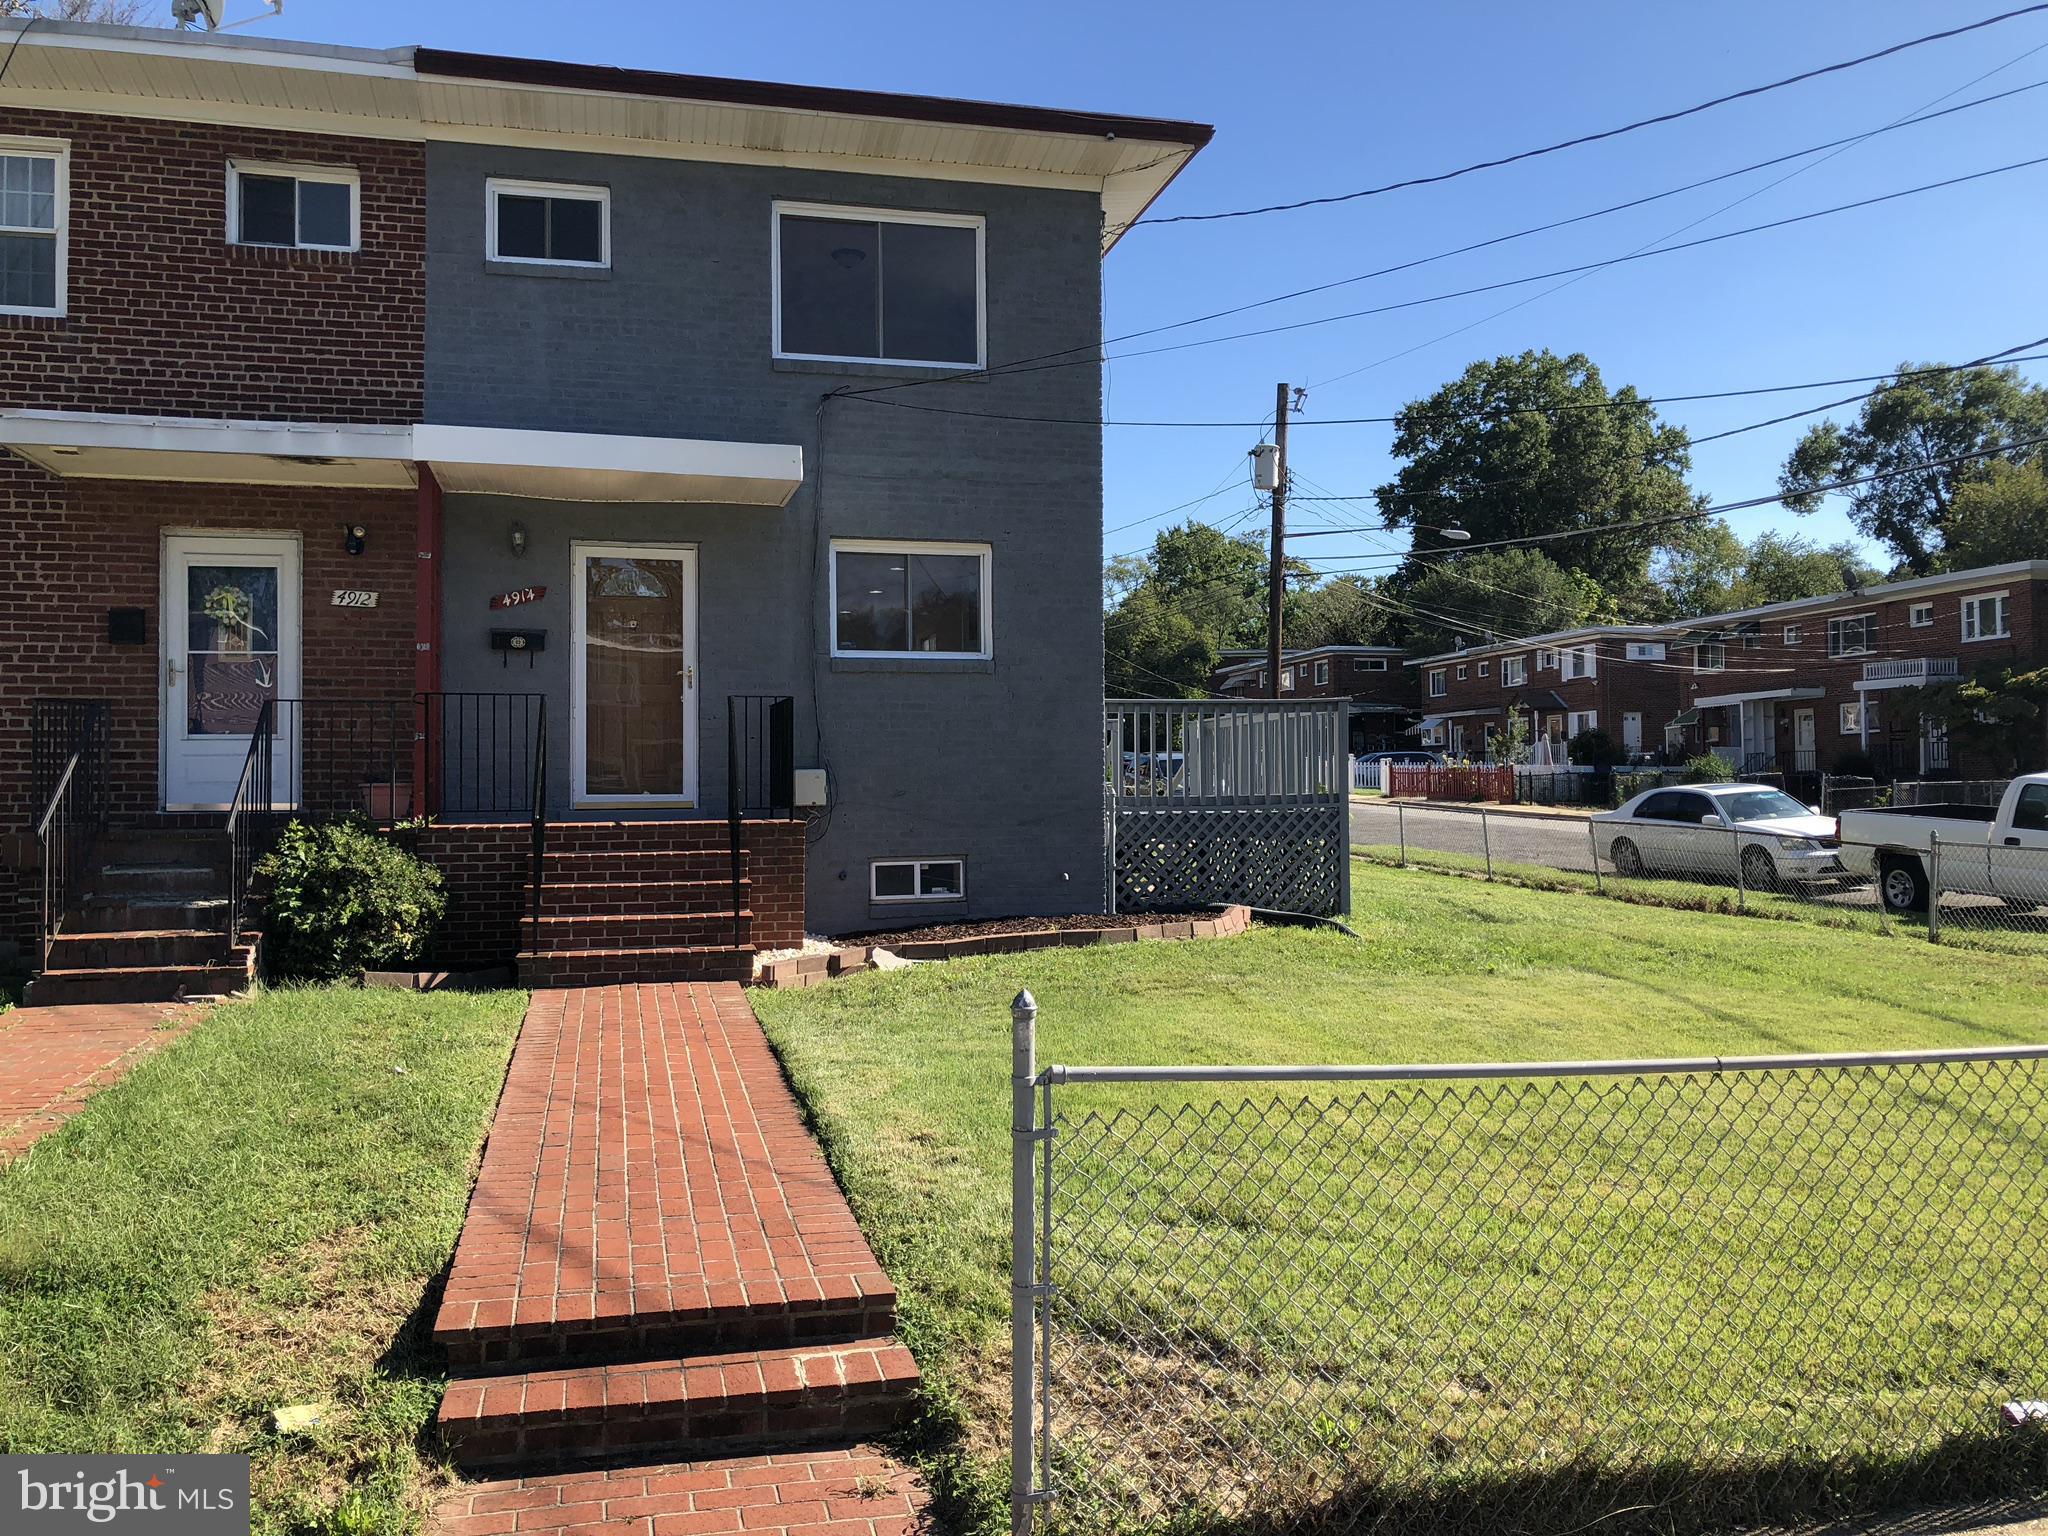 4914 WINTHROP STREET, OXON HILL, MD 20745